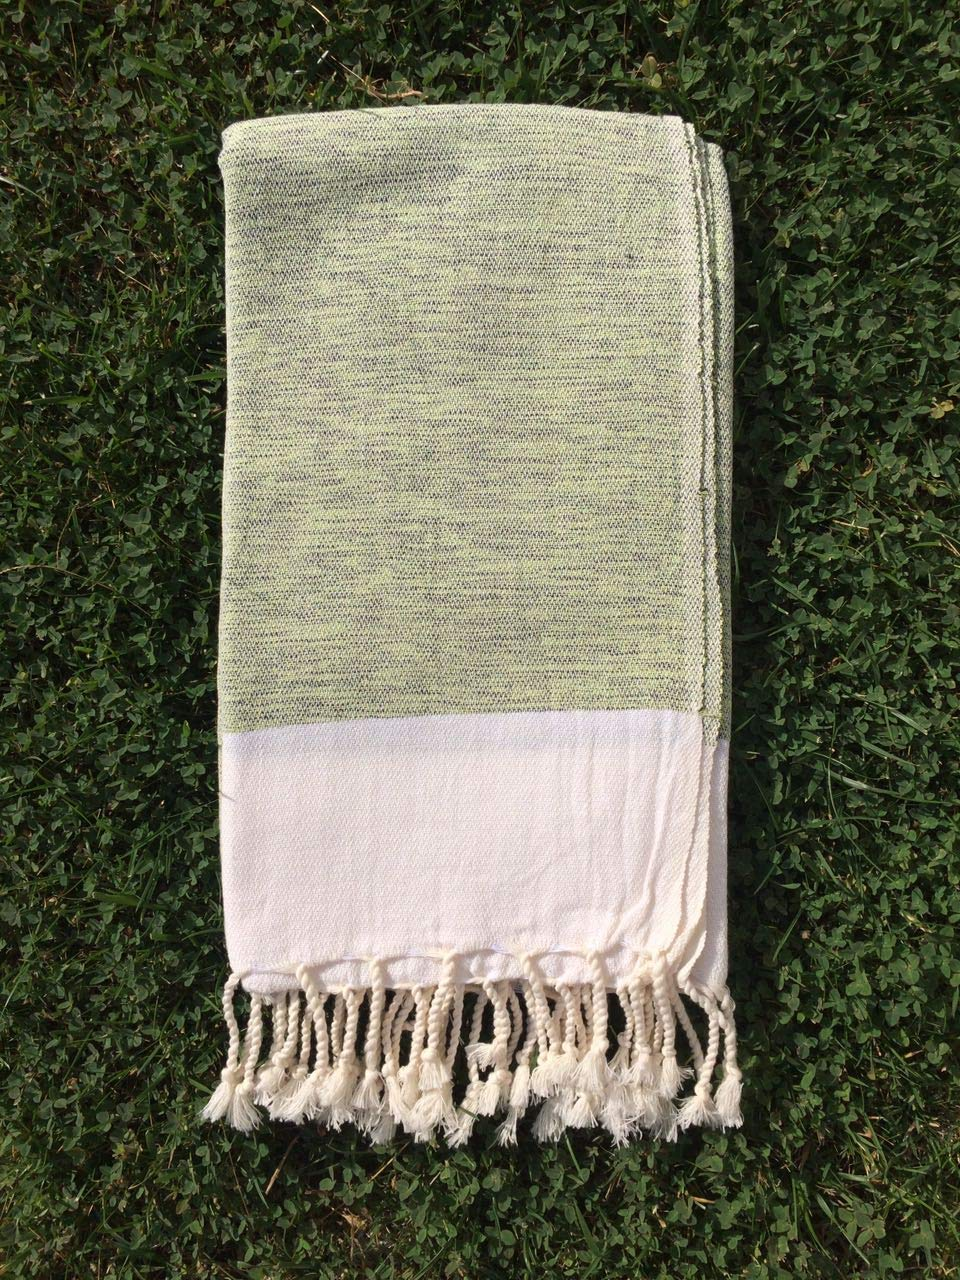 Turkish Cotton Bath Beach Spa Hammam Yoga Gym Yacht Hamam Towel Wrap Pareo Fouta Throw Peshtemal Pestemal Sheet Blanket (green)